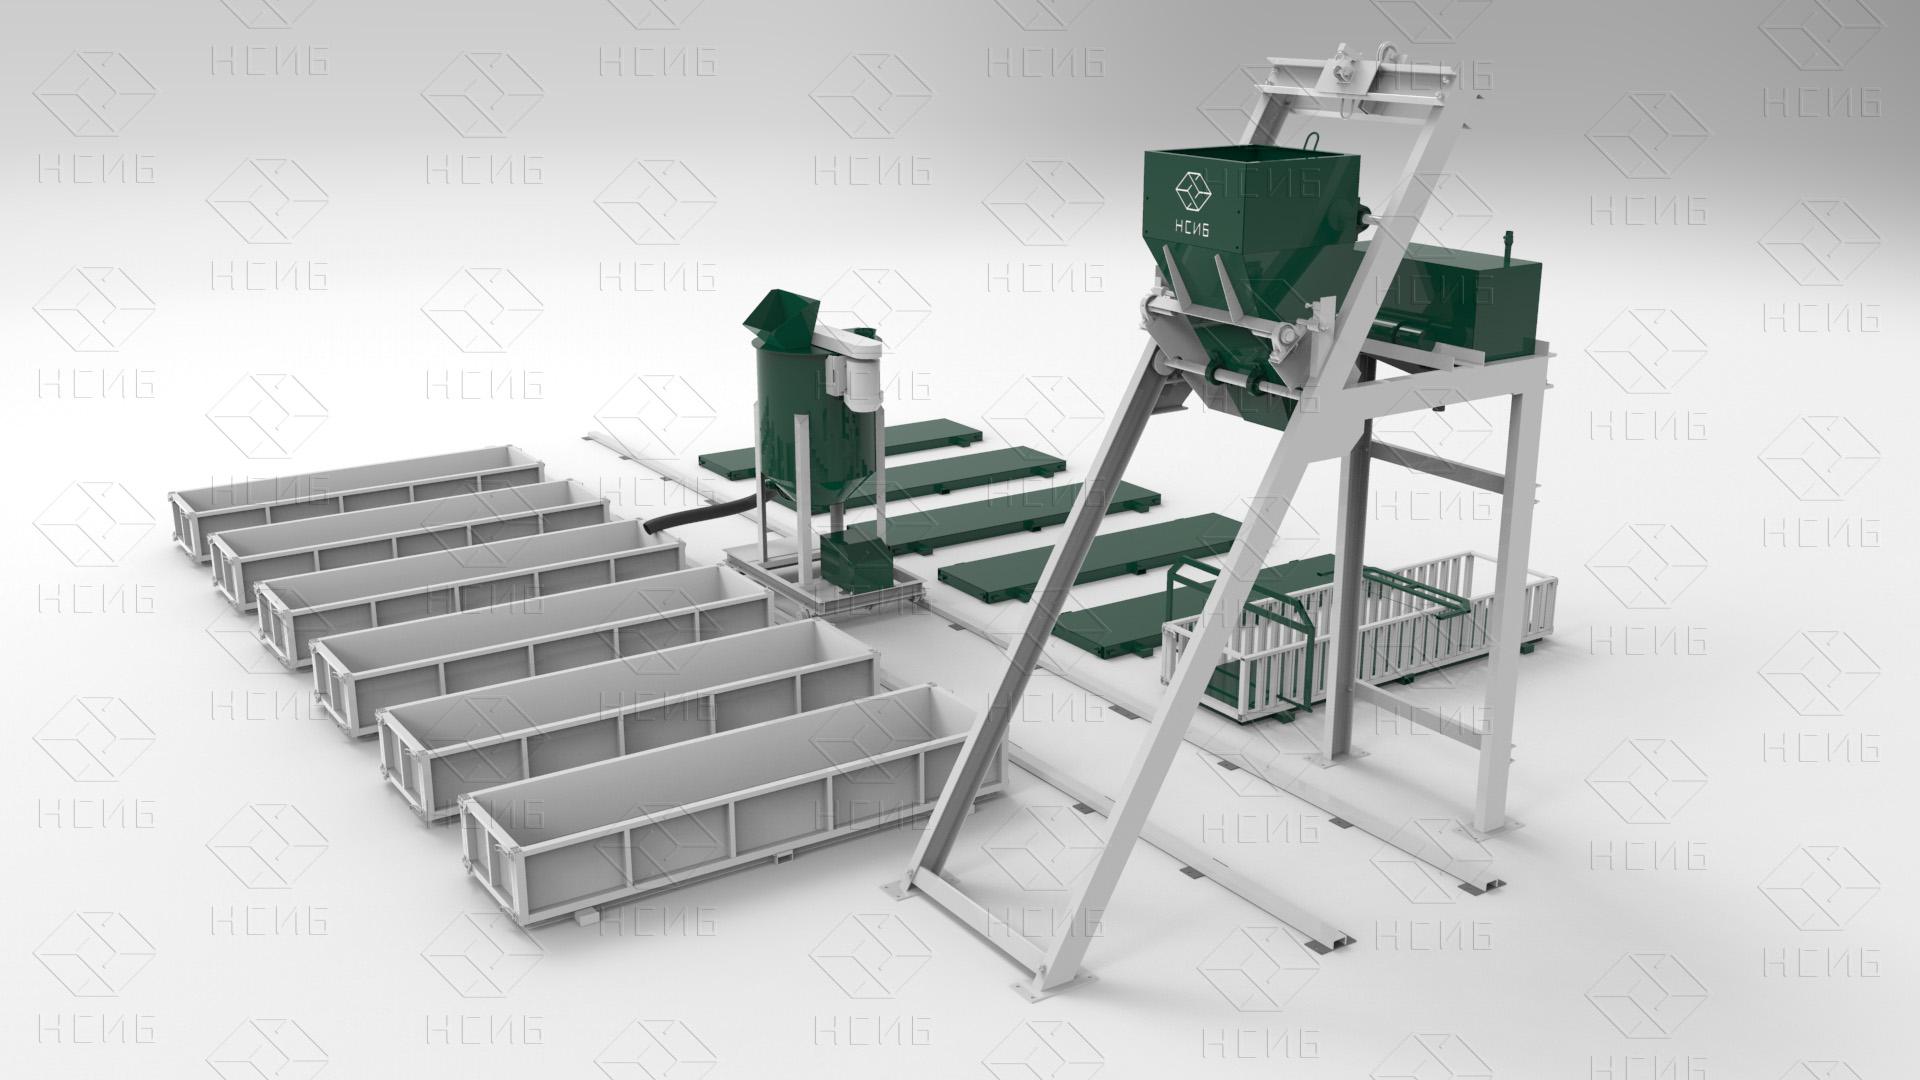 №20575 Оборудование для производства газобетона НСИБ